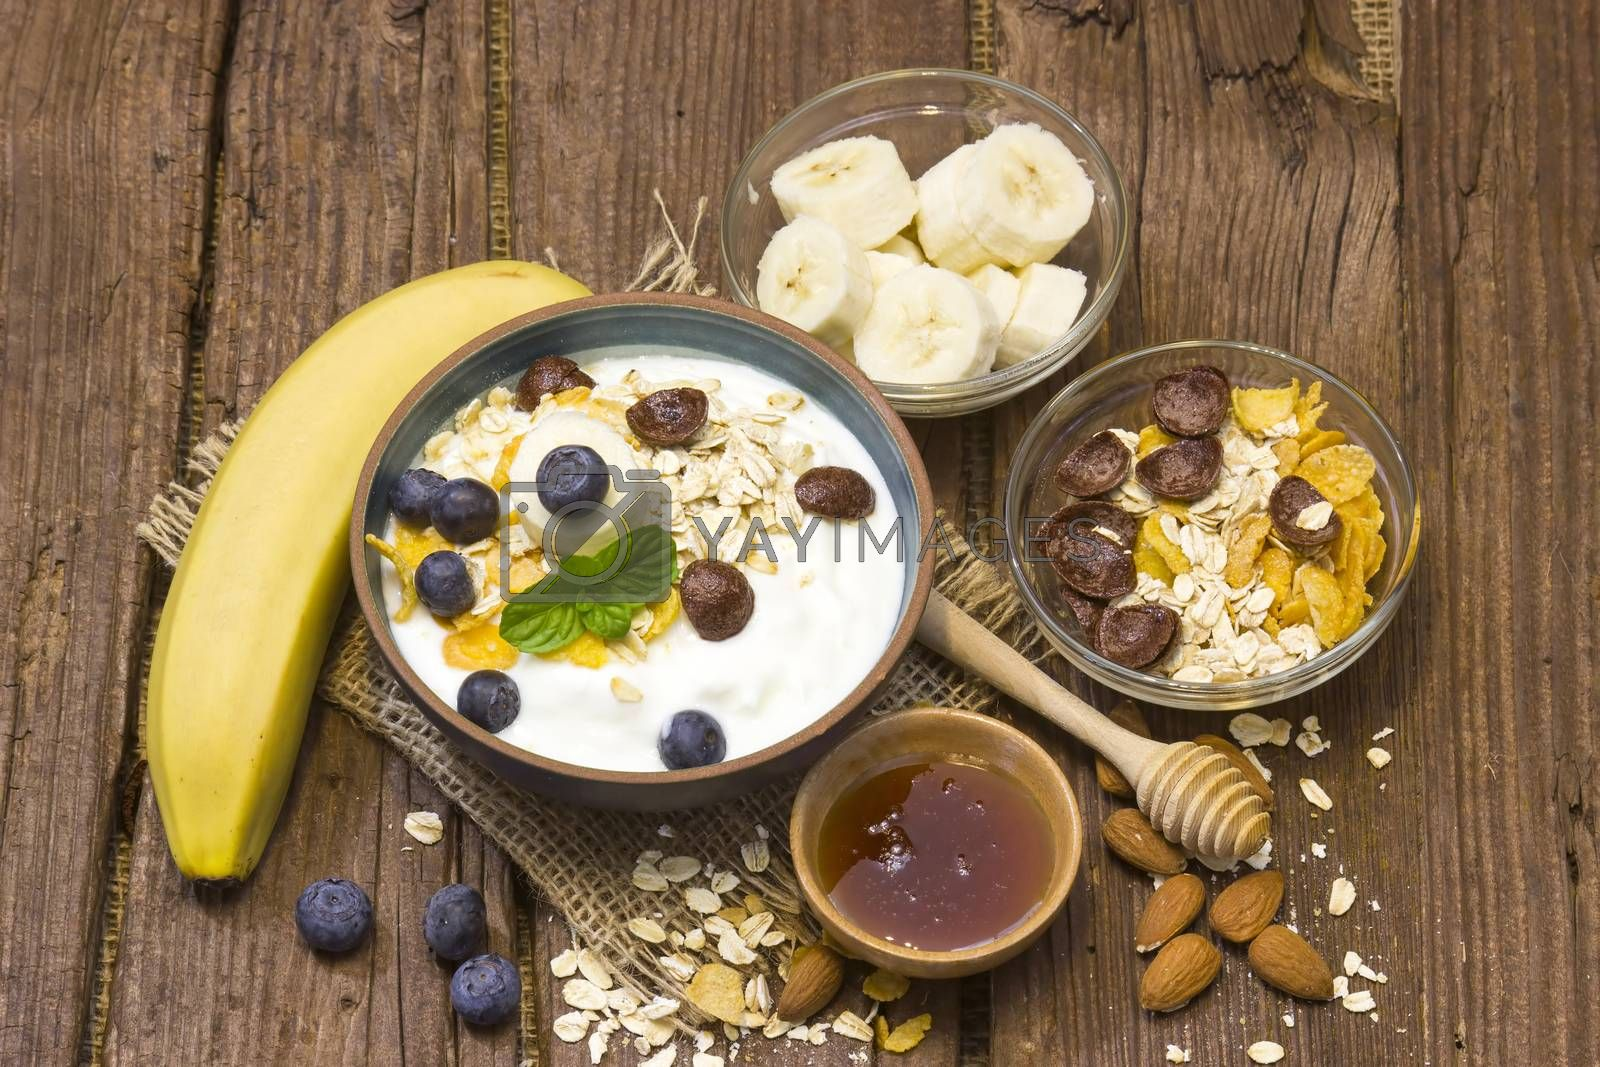 healthy breakfast - muesli with fruit, yogurt and honey